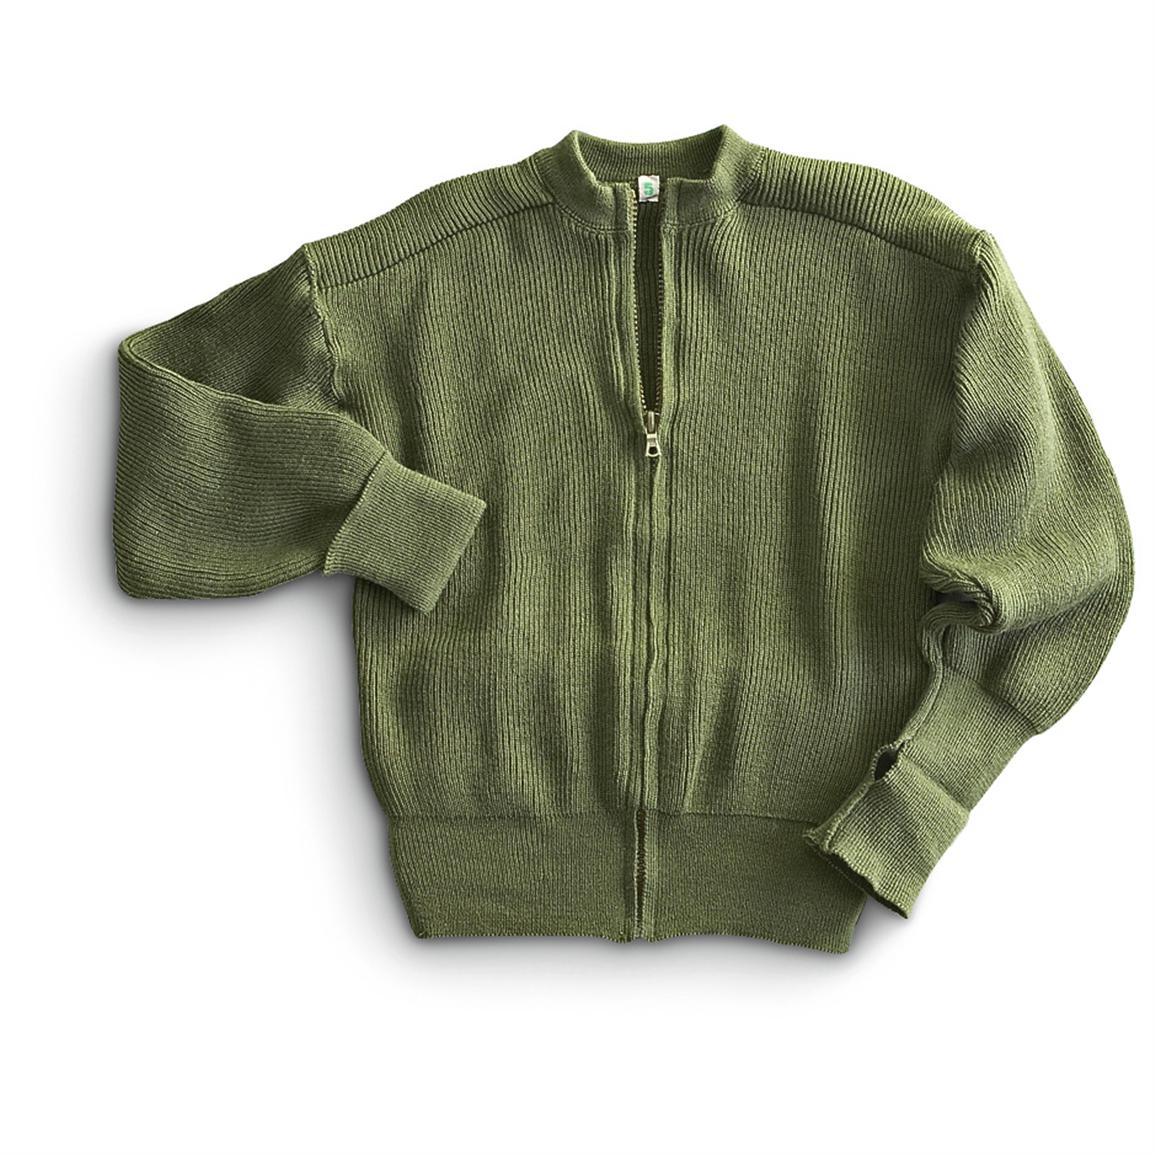 Custom unisex military cardigan sweater full zipper army green warm sweater